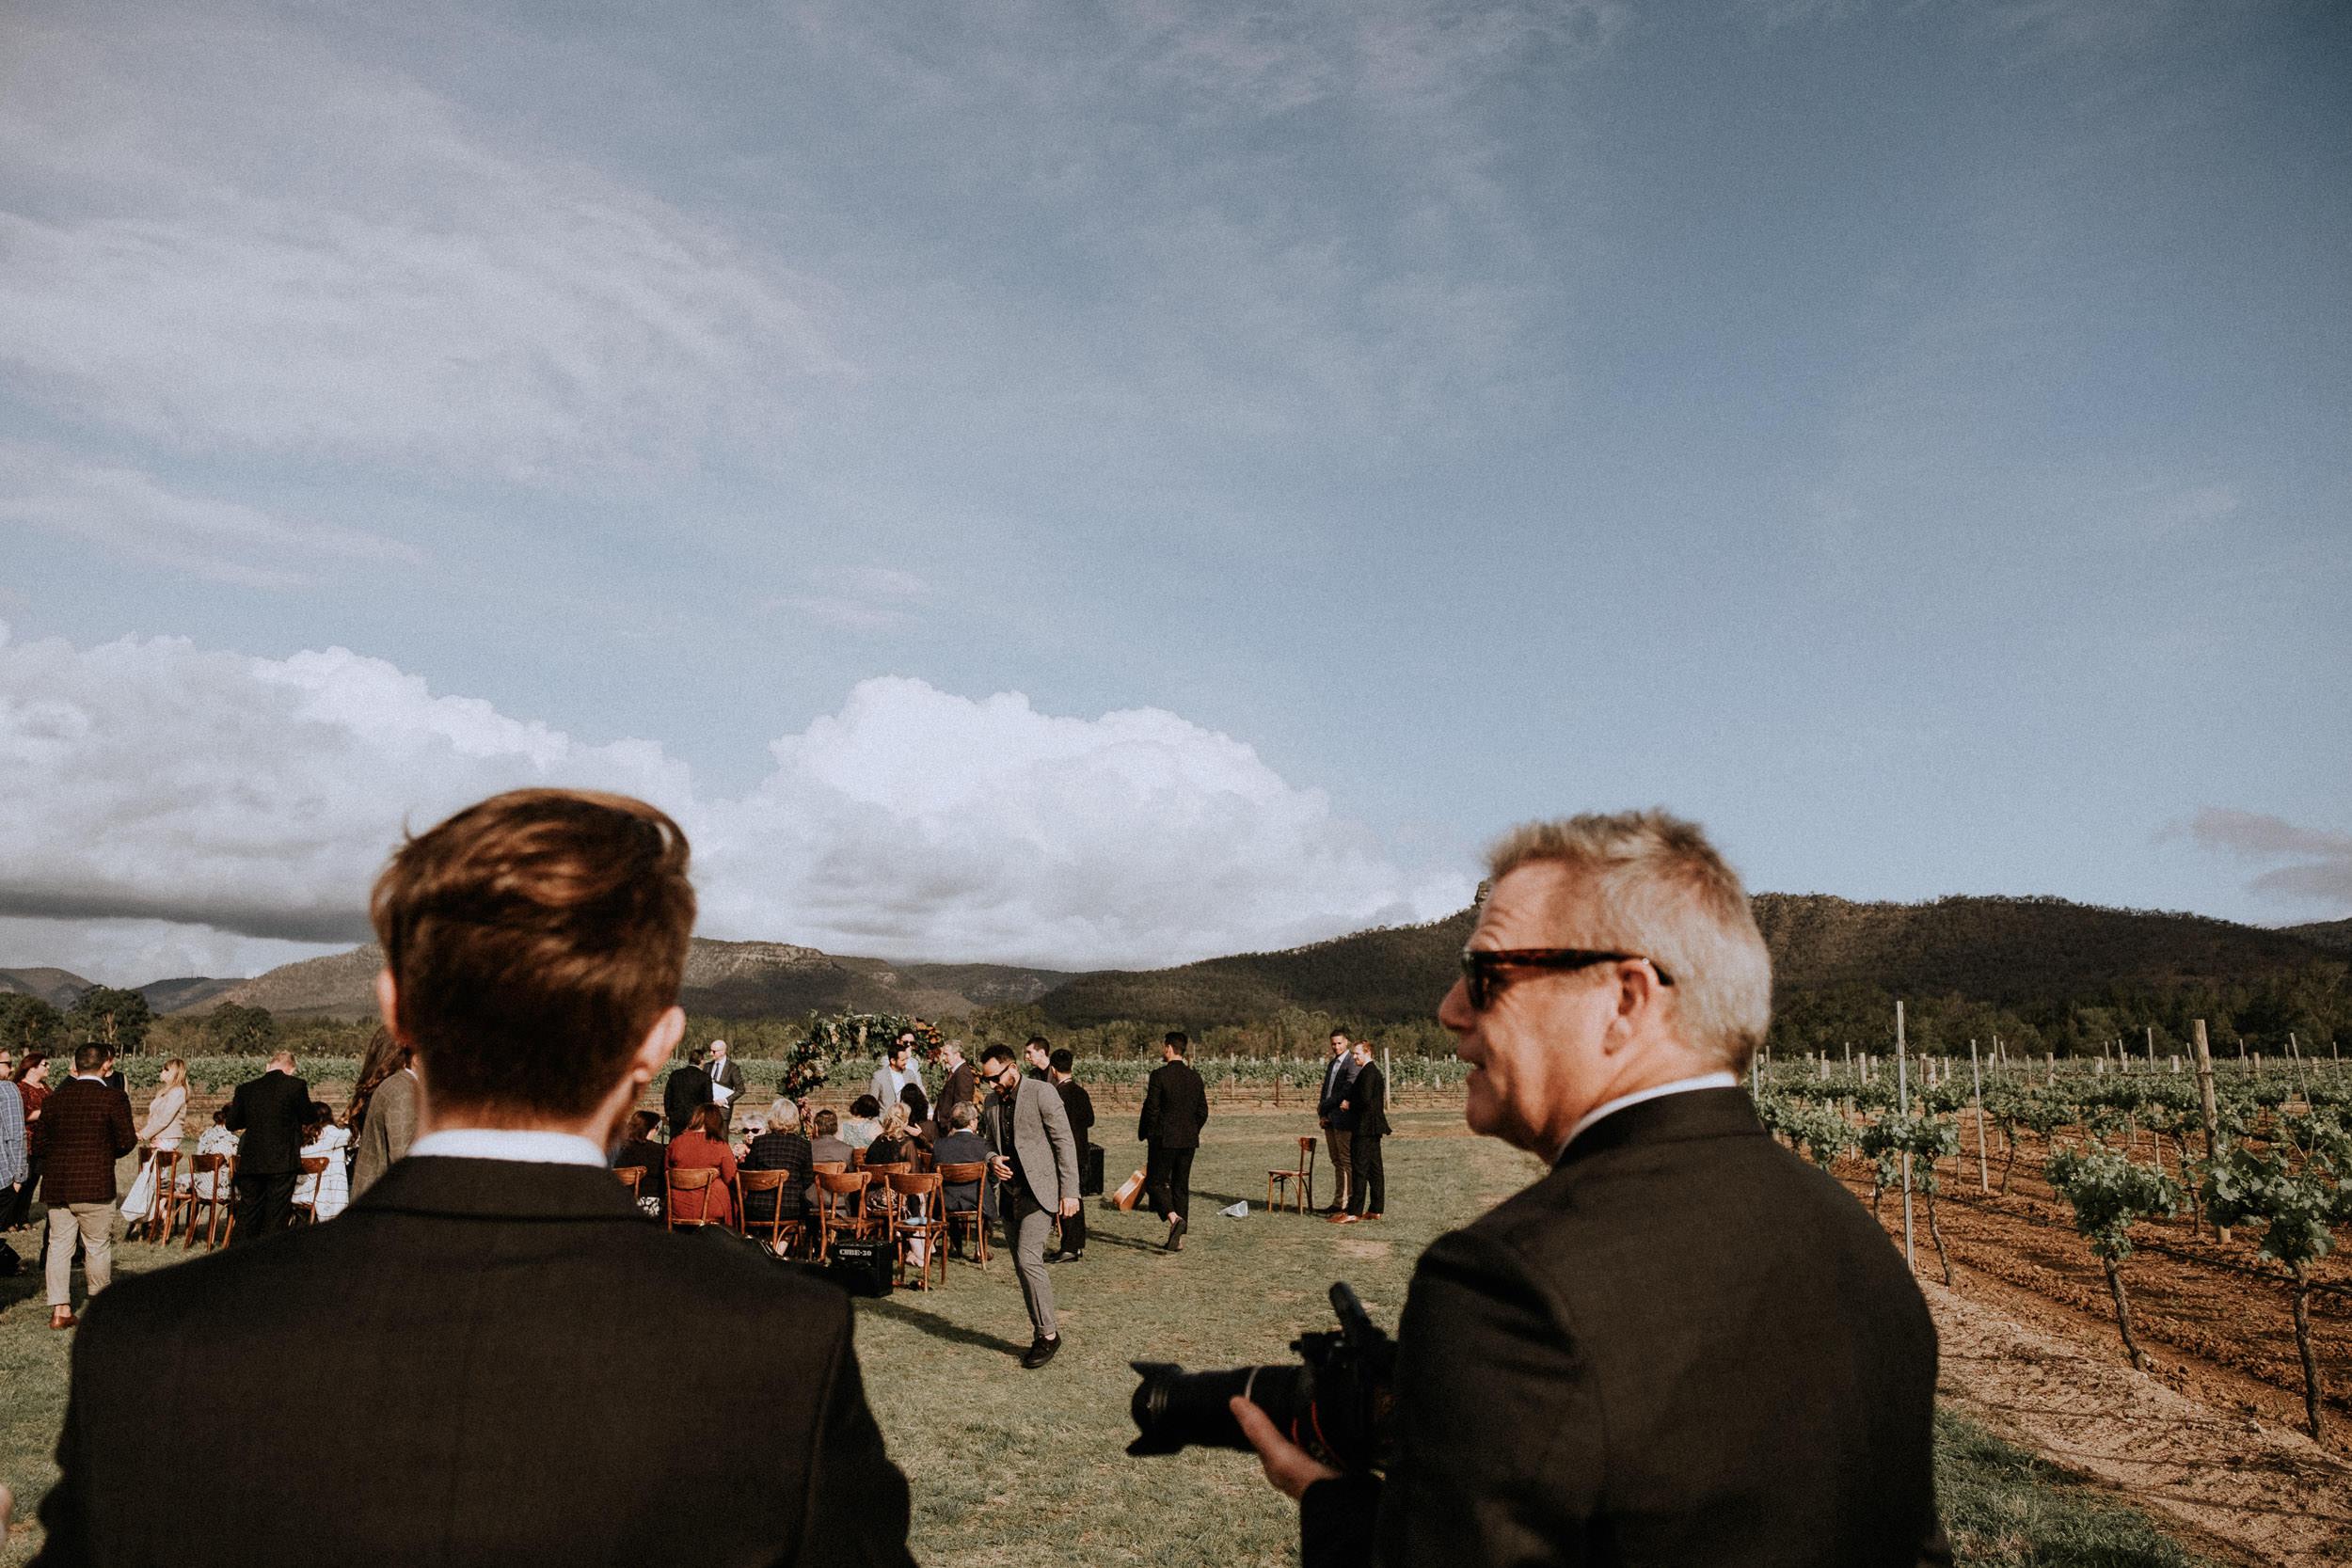 s+j_top_elopement wedding photography_kings & thieves_blog - 164.jpg